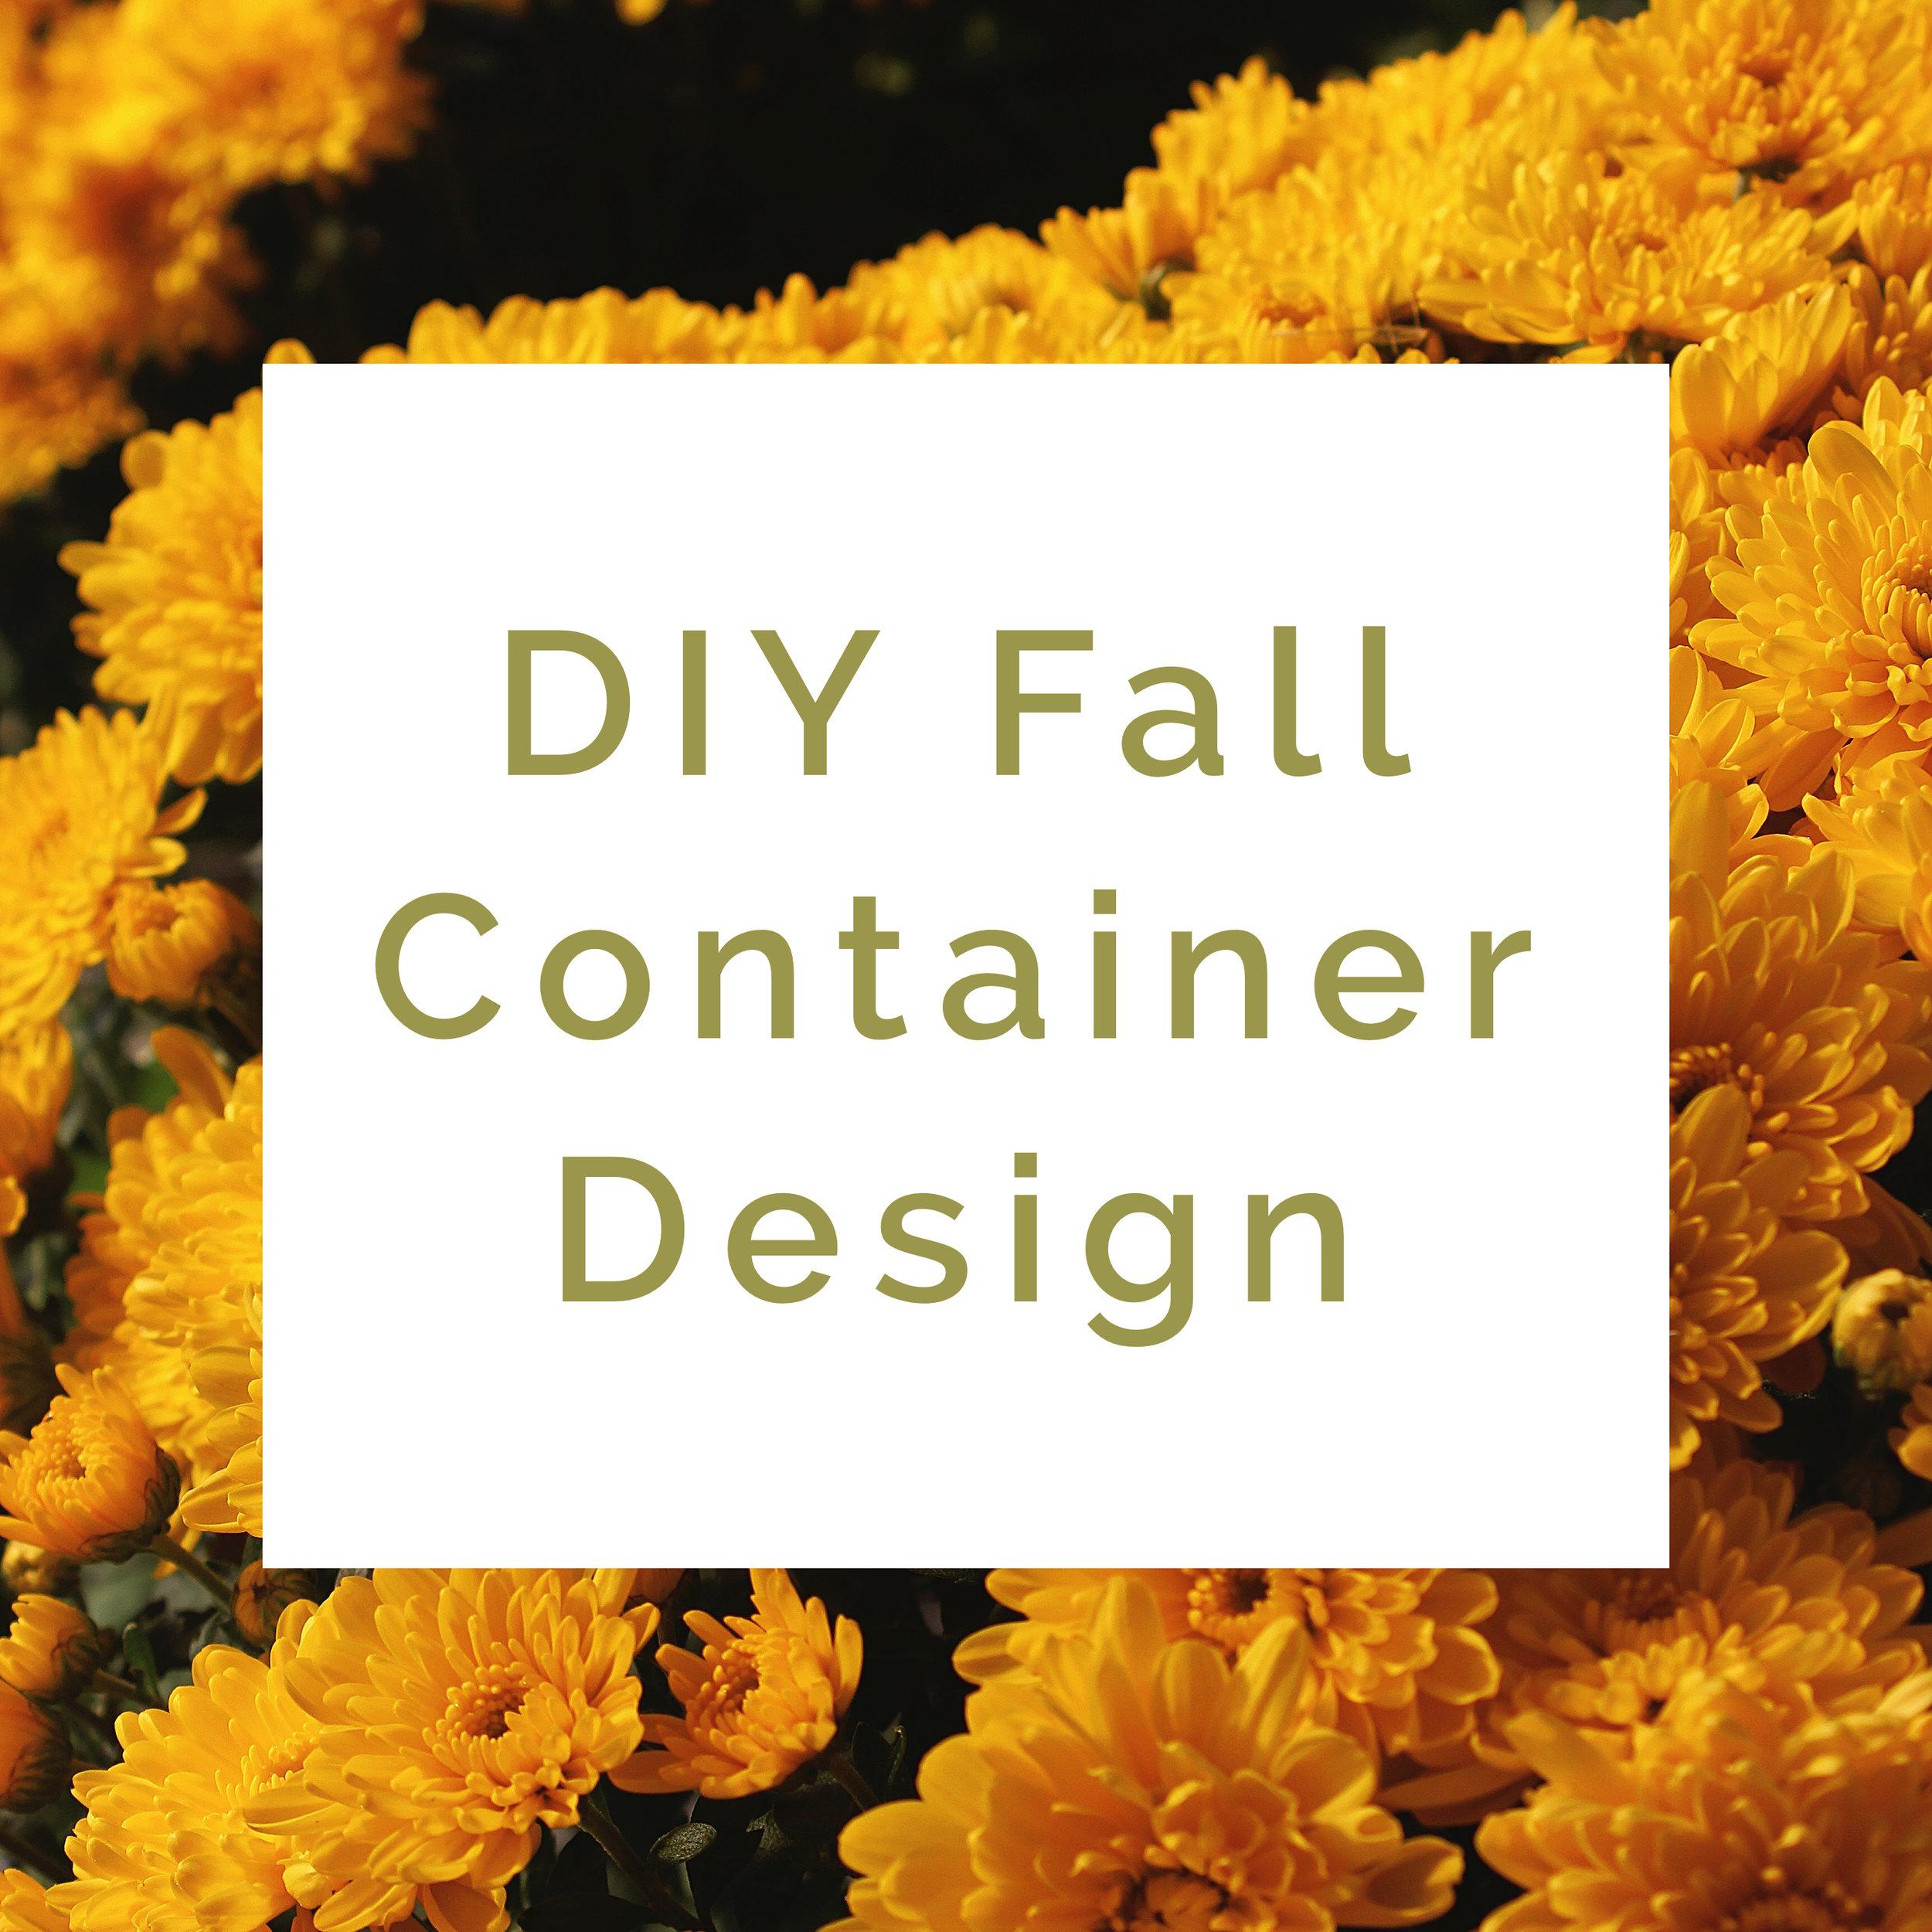 diy fall container design.jpg